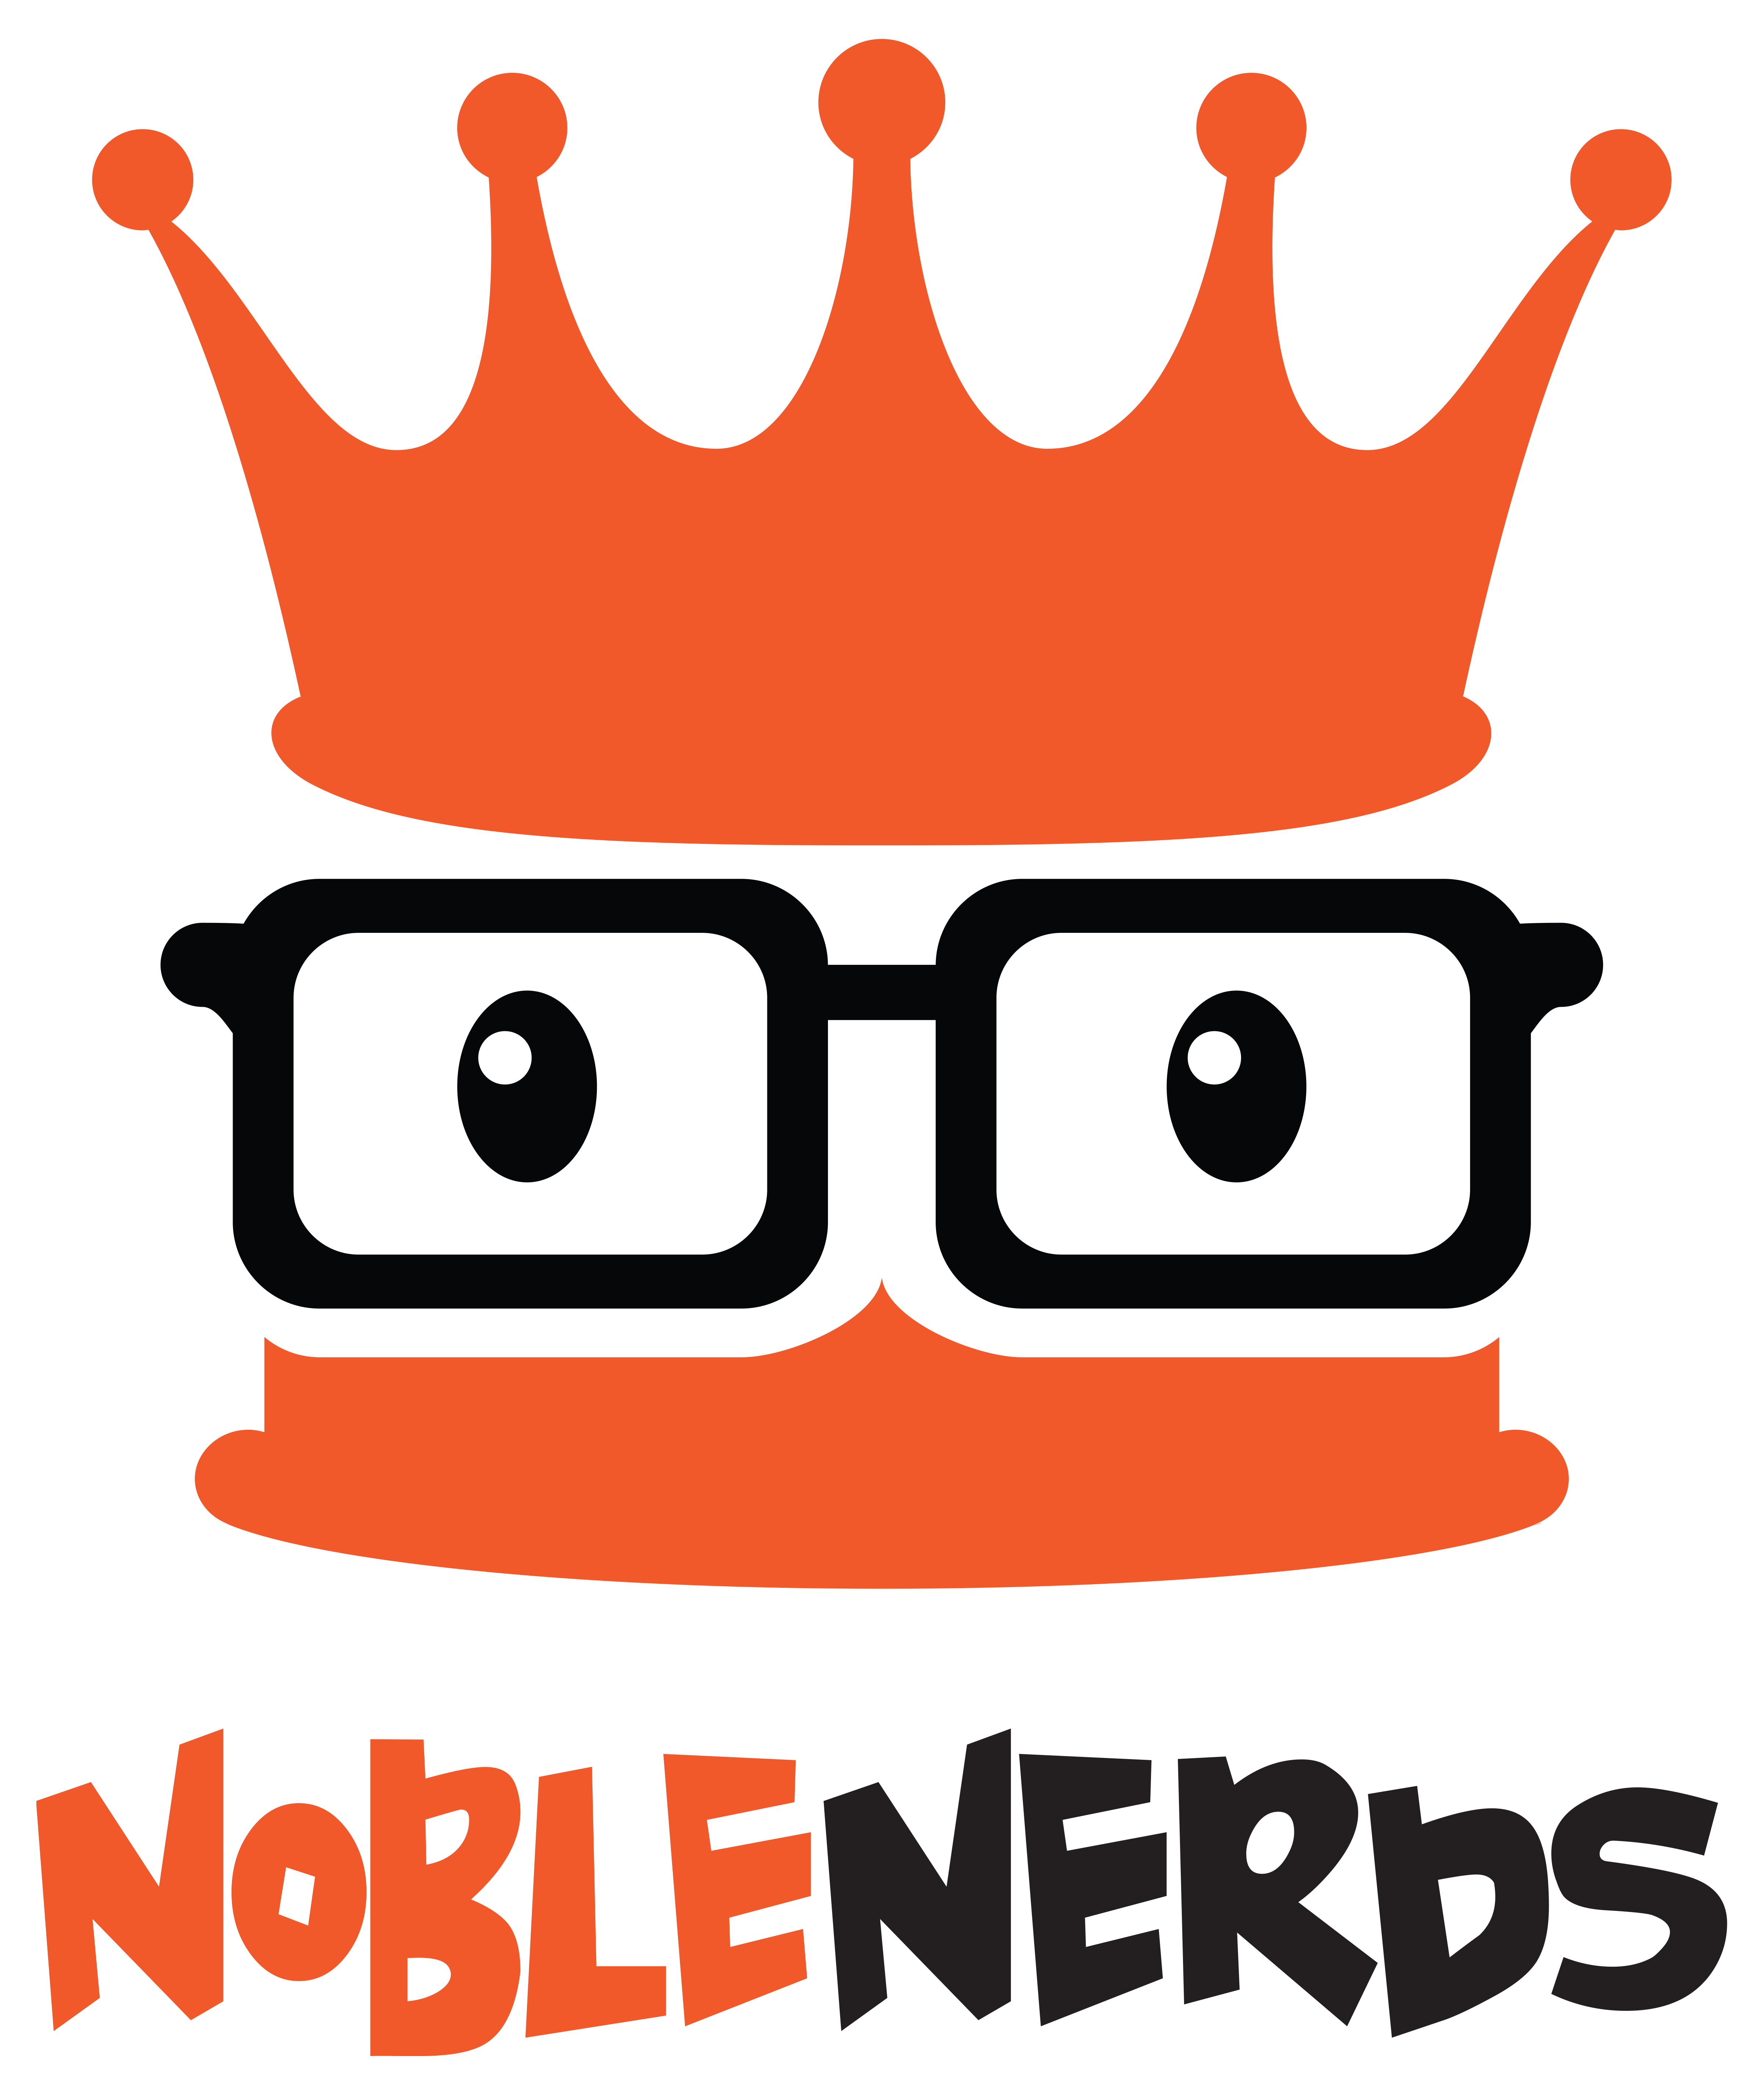 Noble Website Design